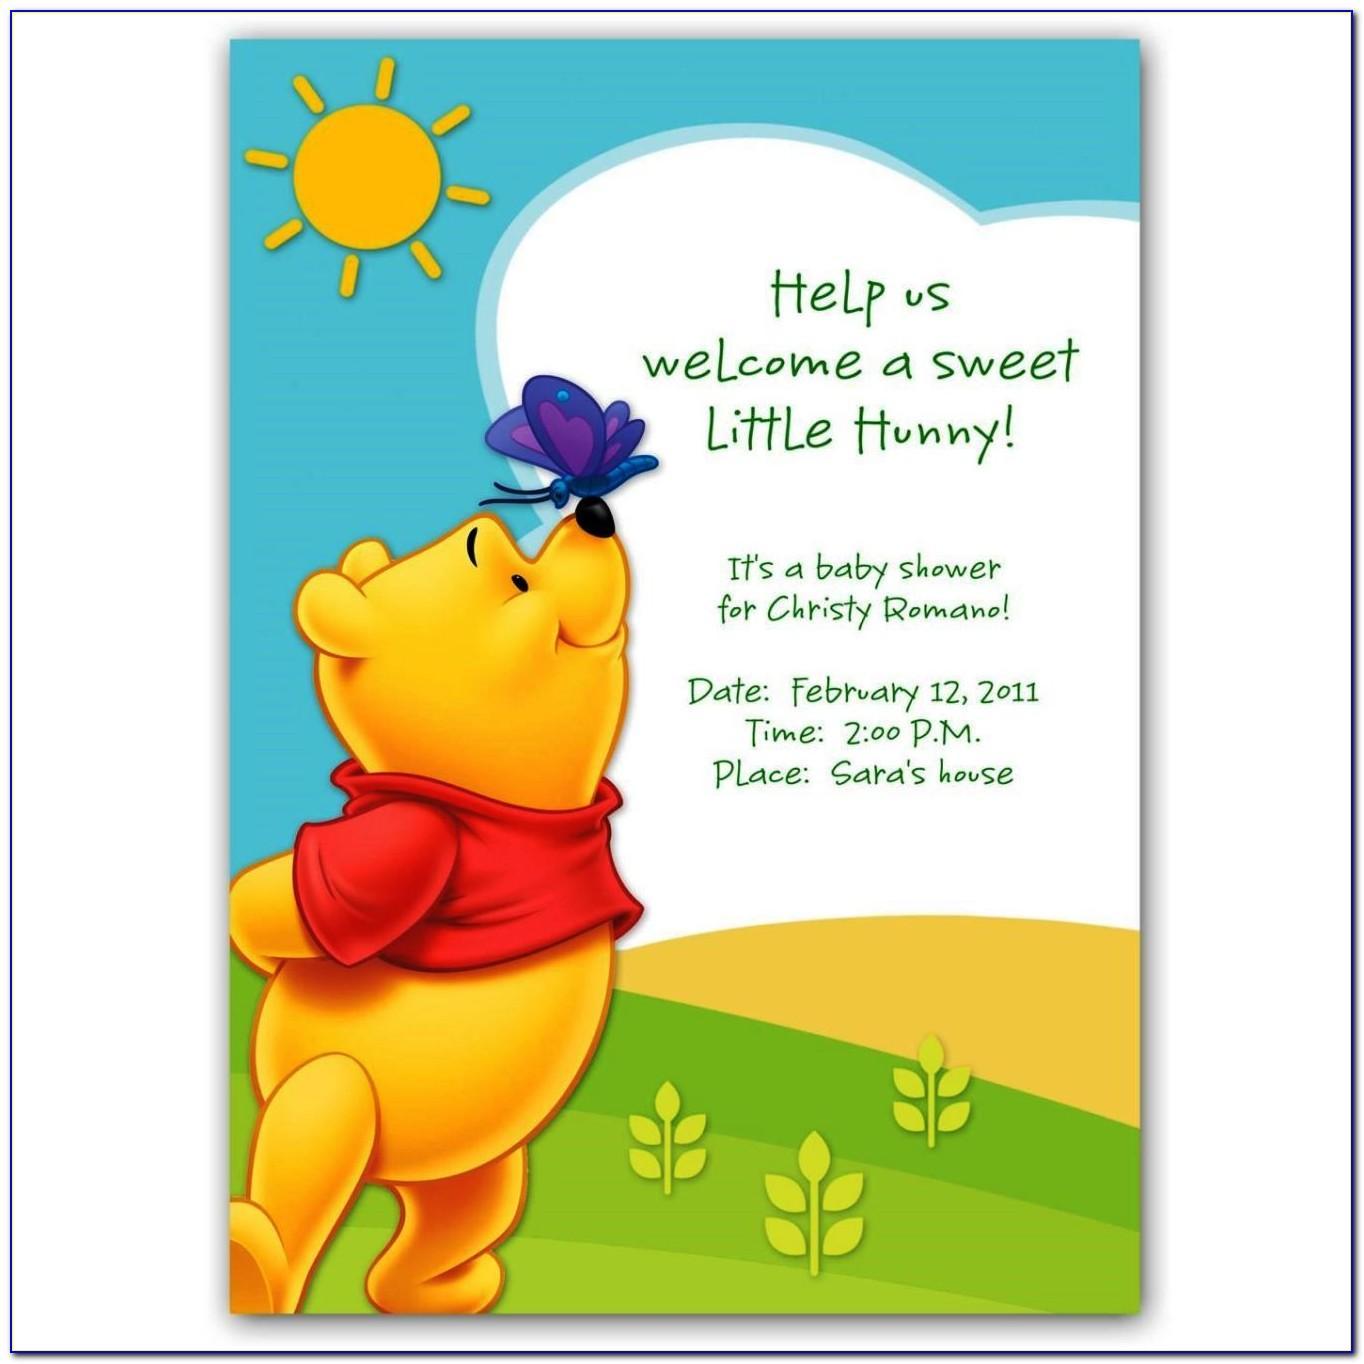 Winnie The Pooh Baby Shower Invitations Free Printable